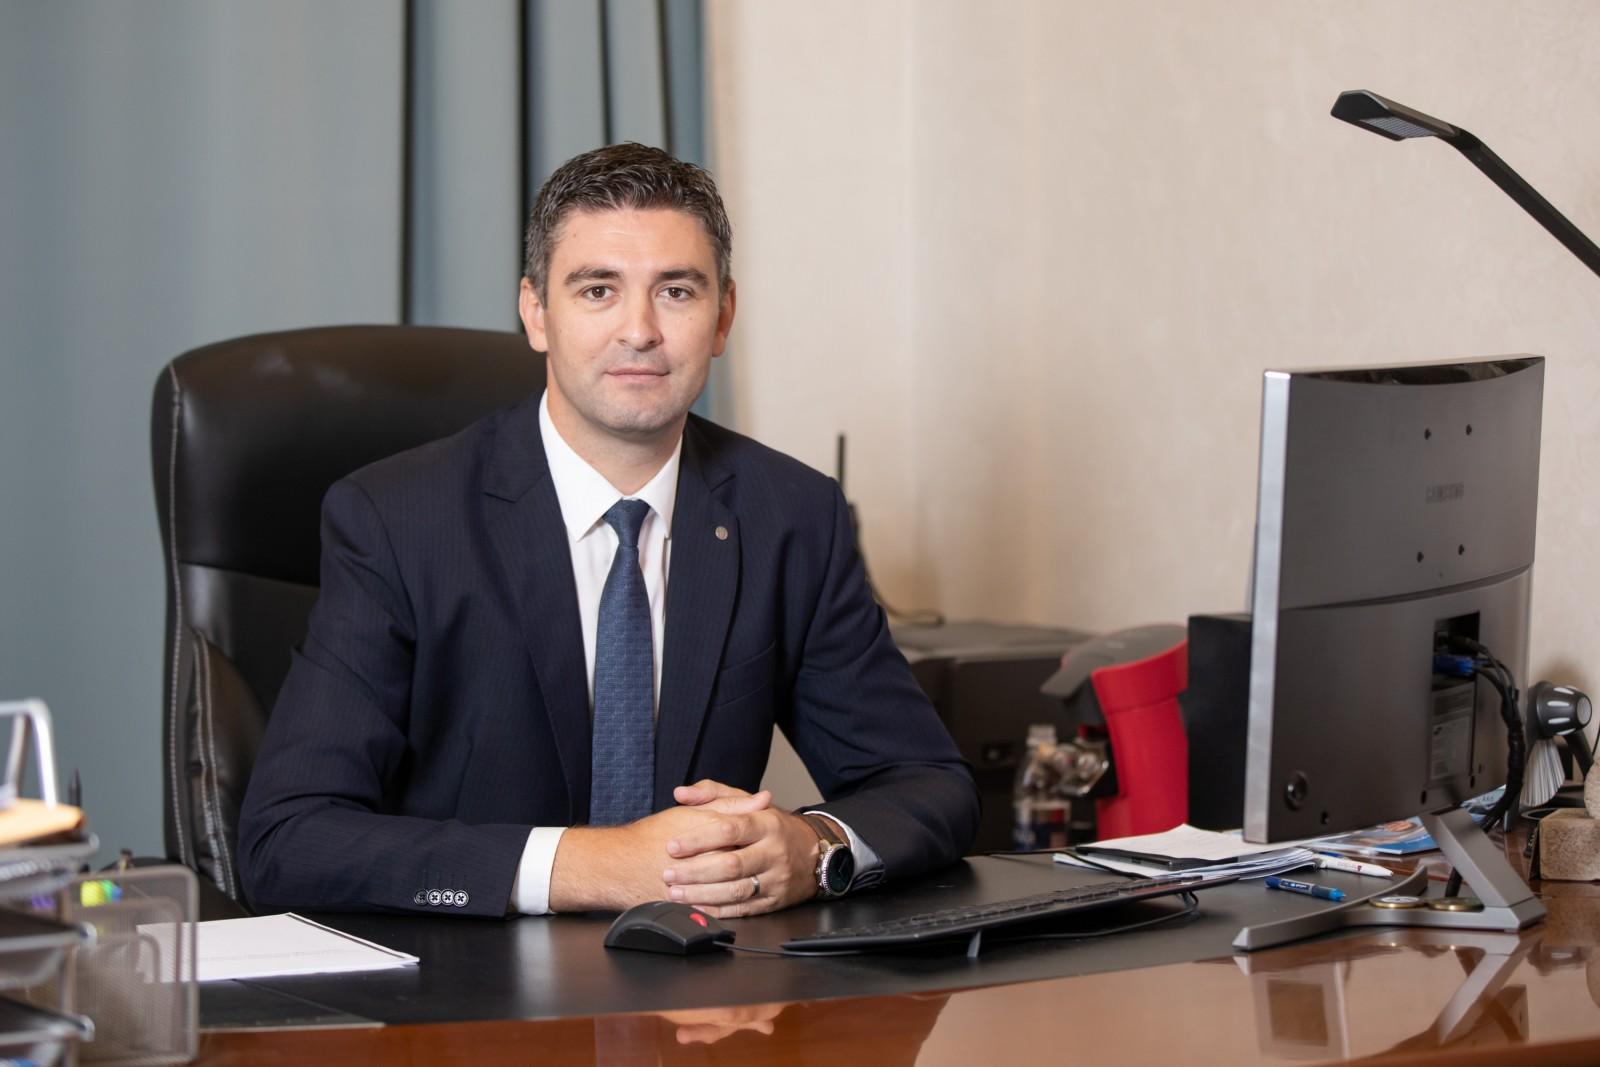 Gradonačelnik Franković čestitao Pesah